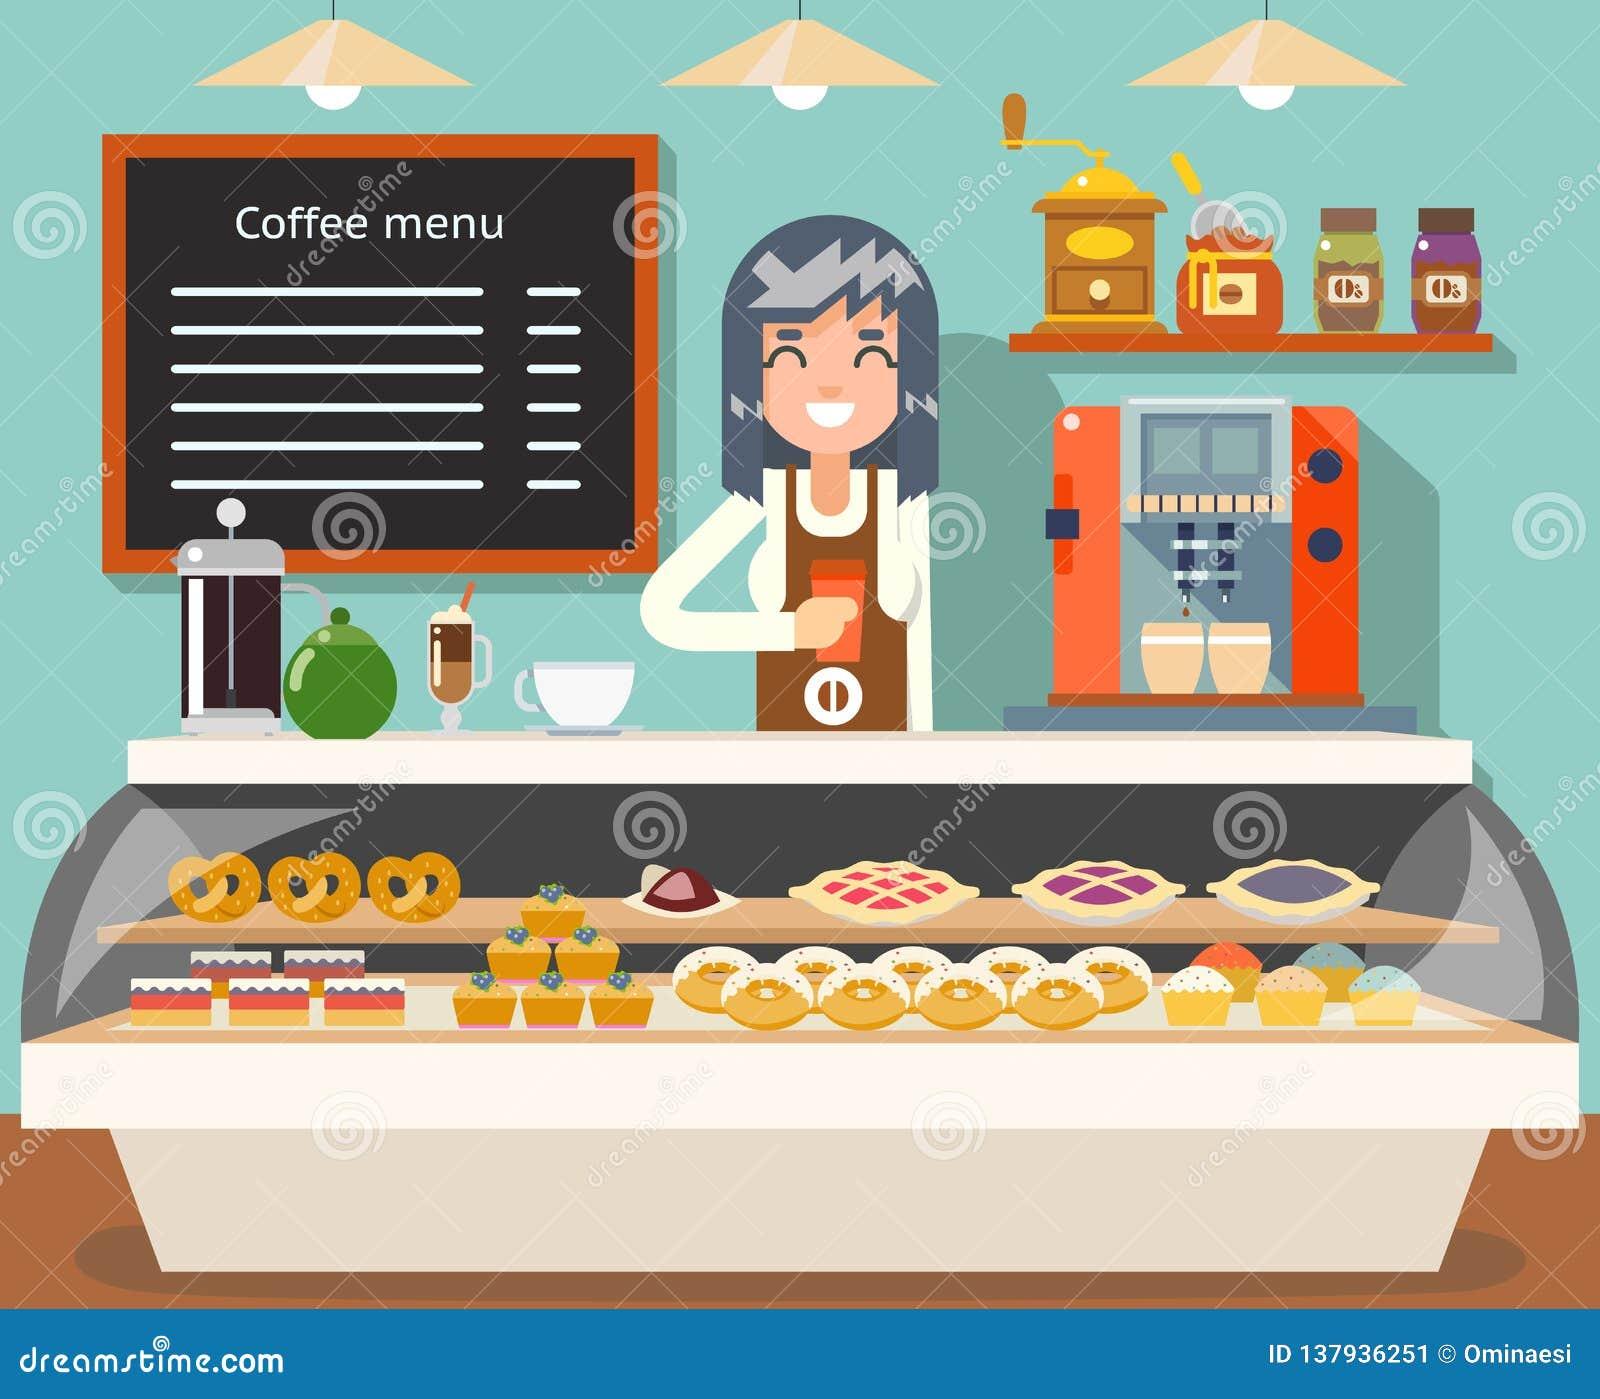 Cafe coffee shop woman business interior female seller bakery taste sweets flat design vector illustration